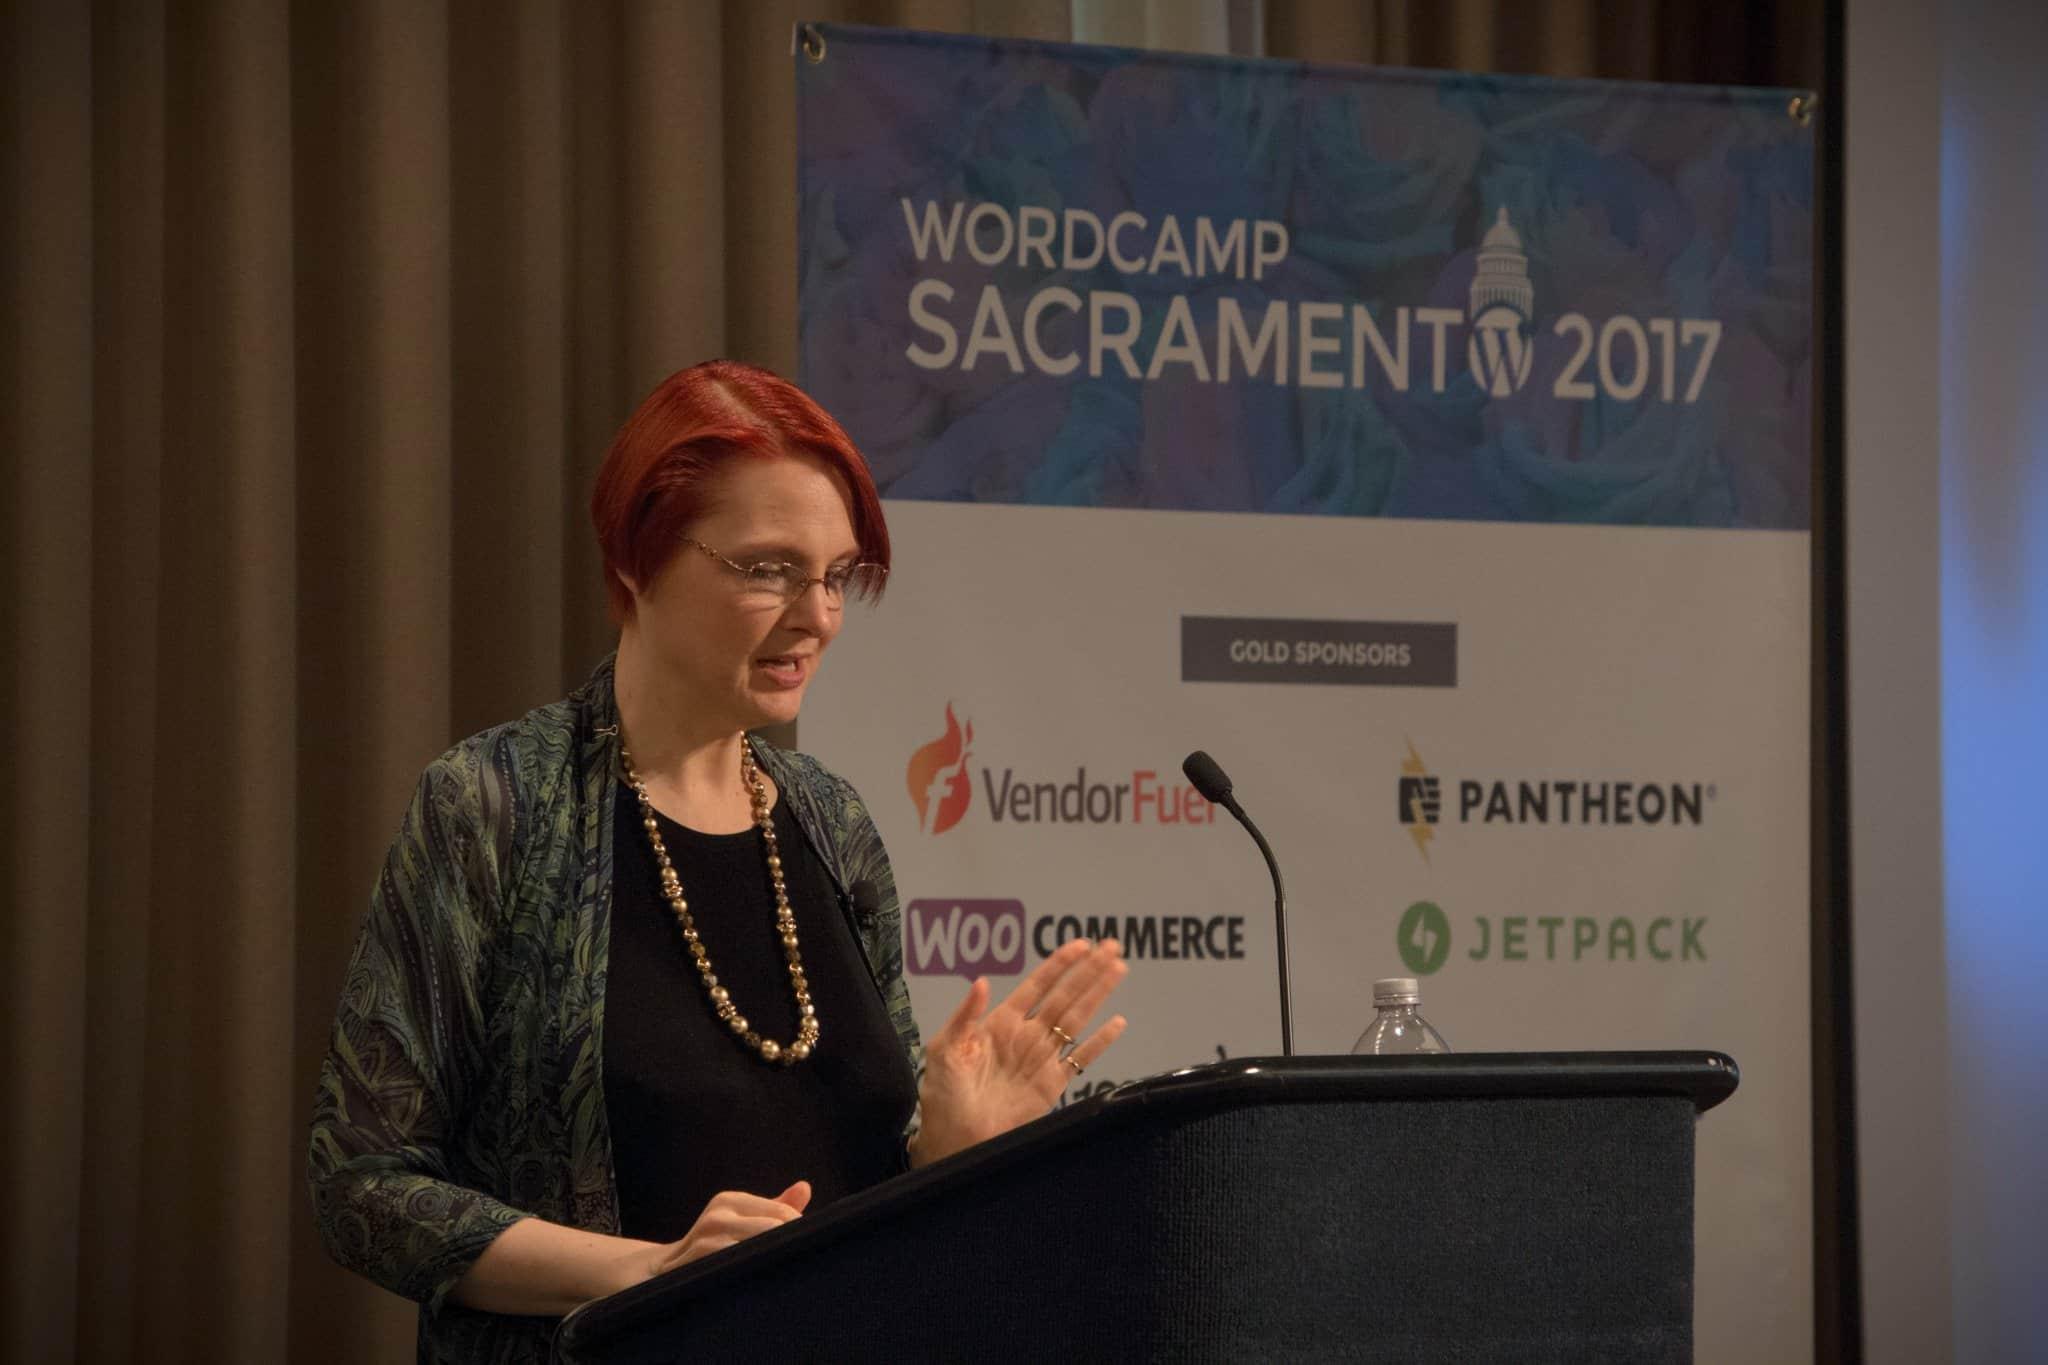 Sallie Goetsch presenting about online newsrooms at WordCamp Sacramento 2017